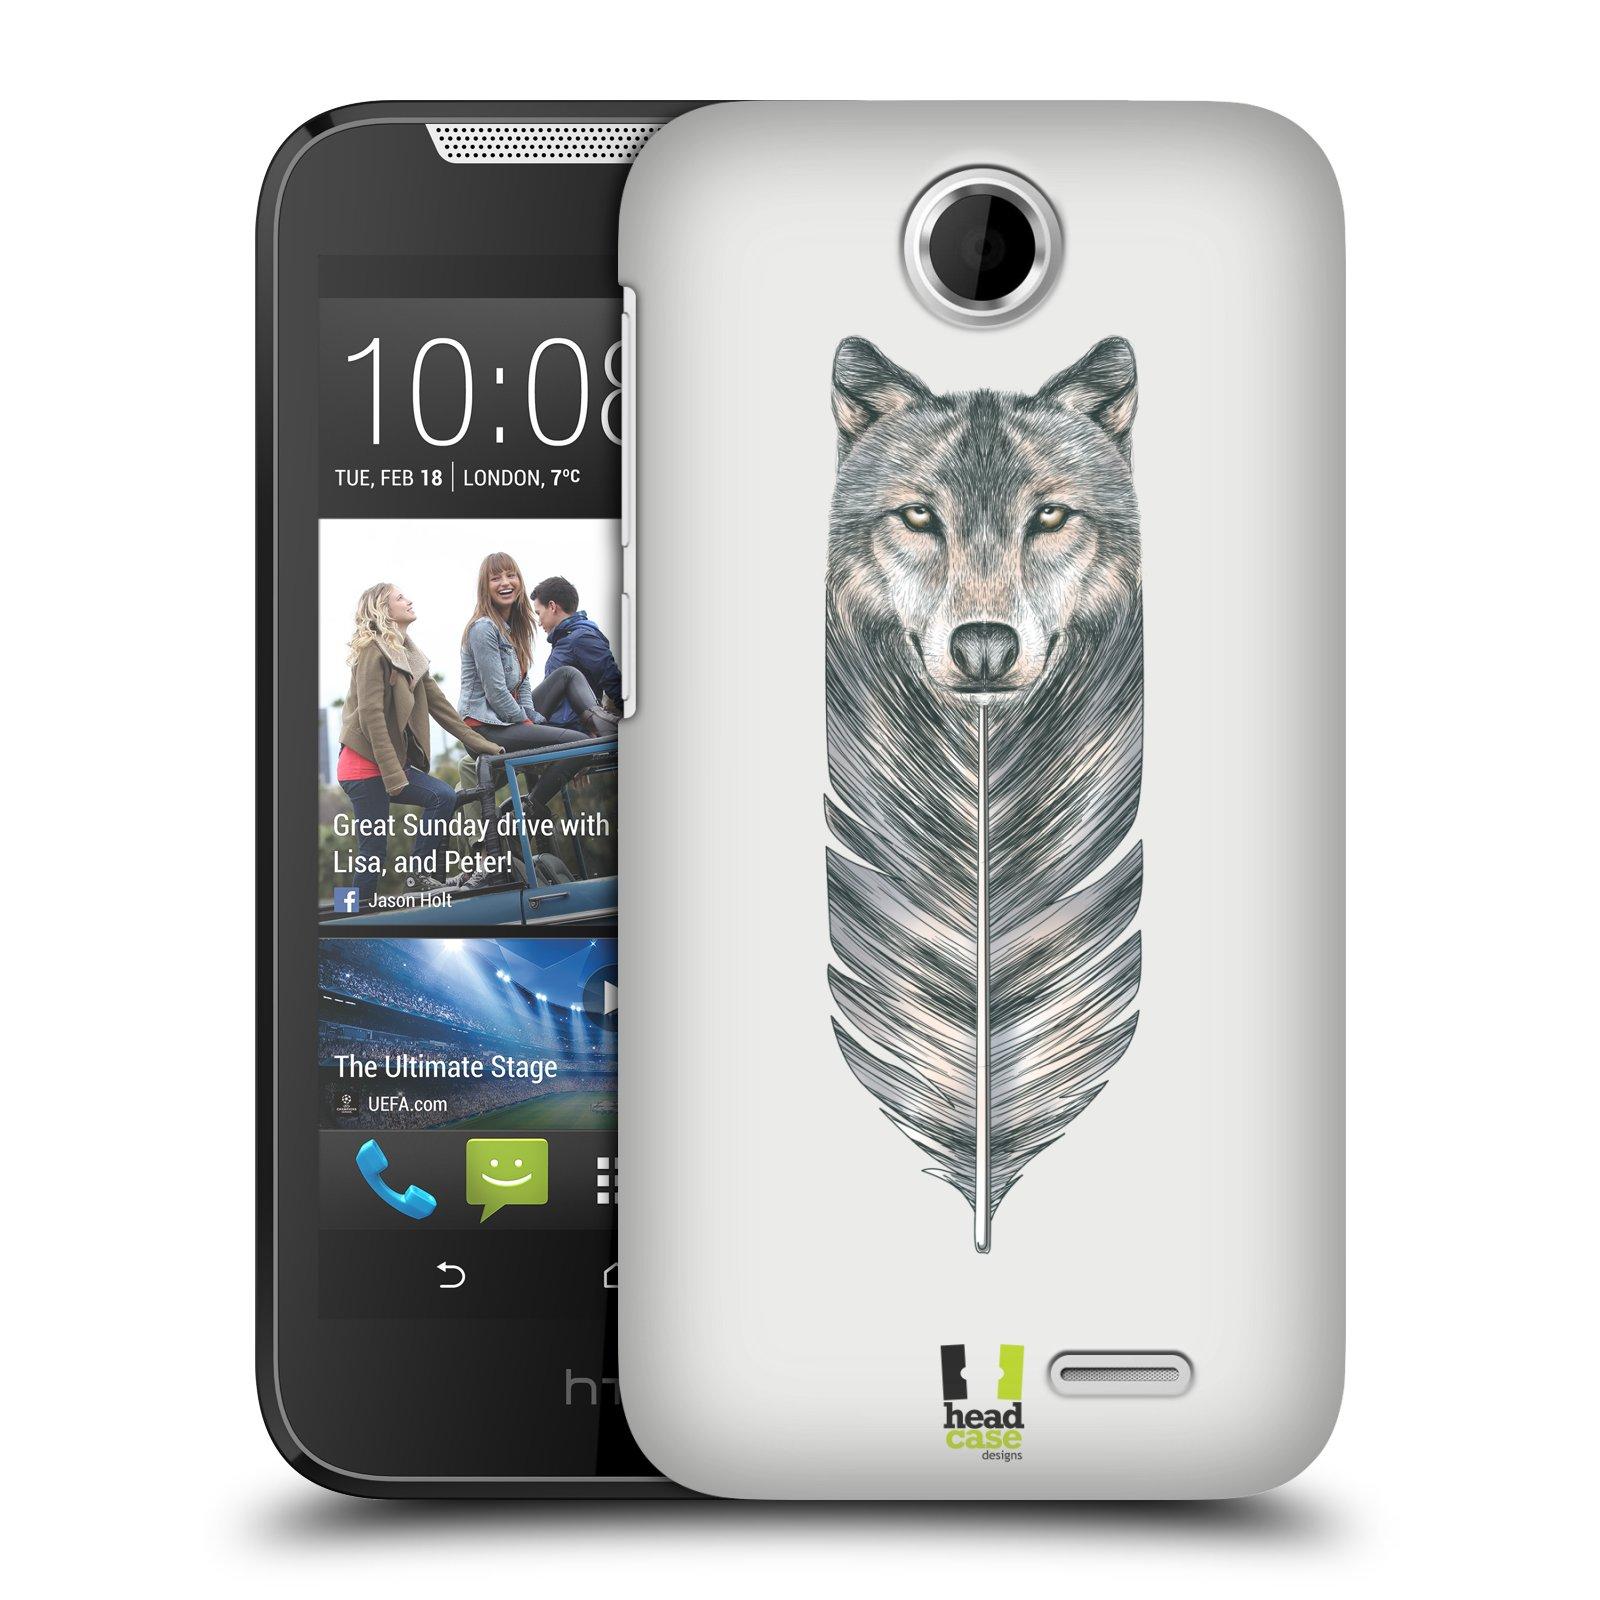 HEAD CASE plastový obal na mobil HTC Desire 310 vzor zvířecí pírka vlk